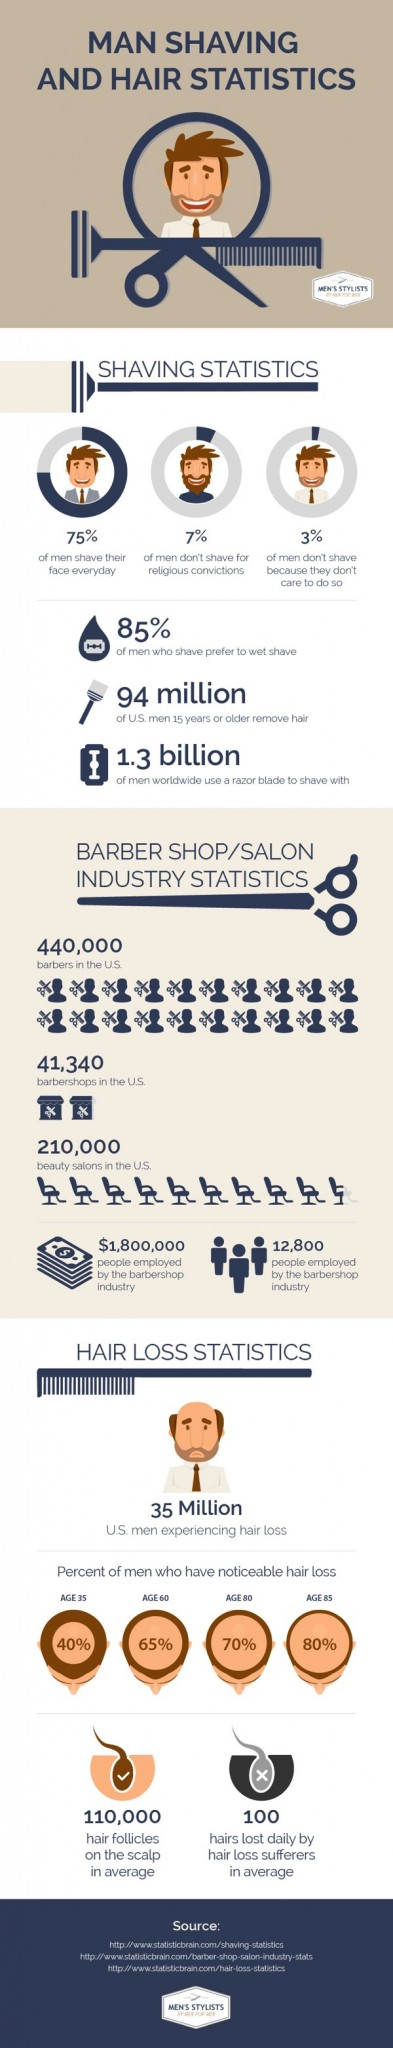 Mens Hair Barbershop Statistics Infographic